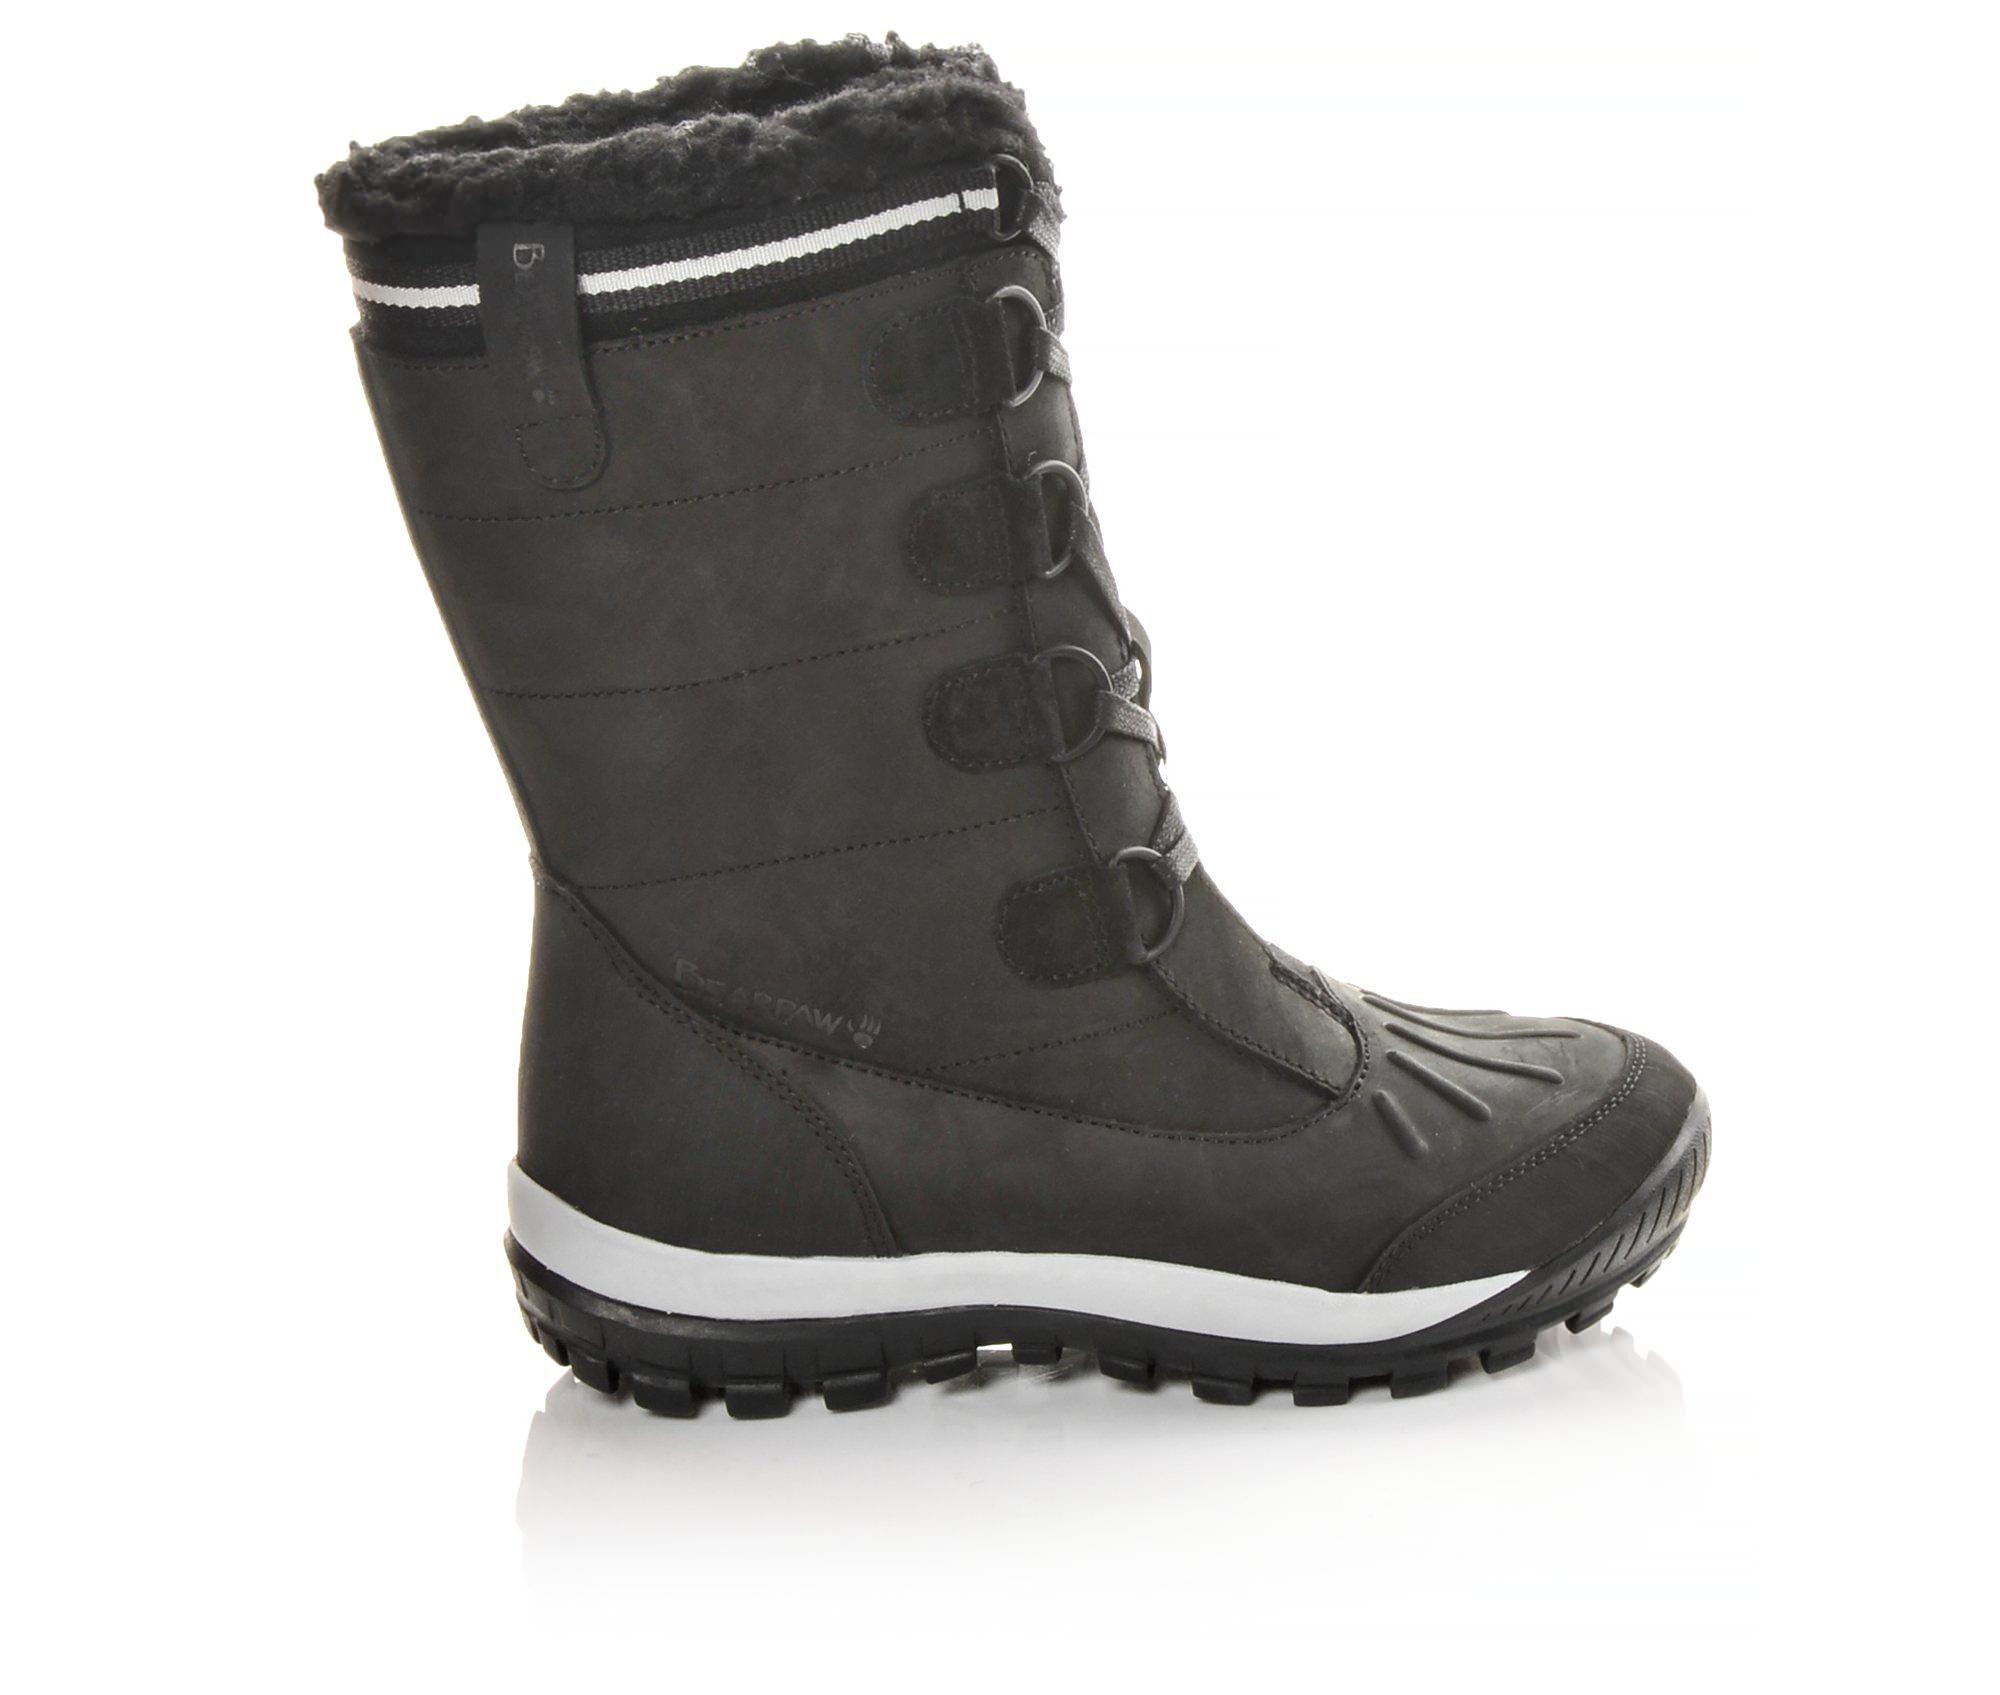 Women's Bearpaw Desdemona Boots Black